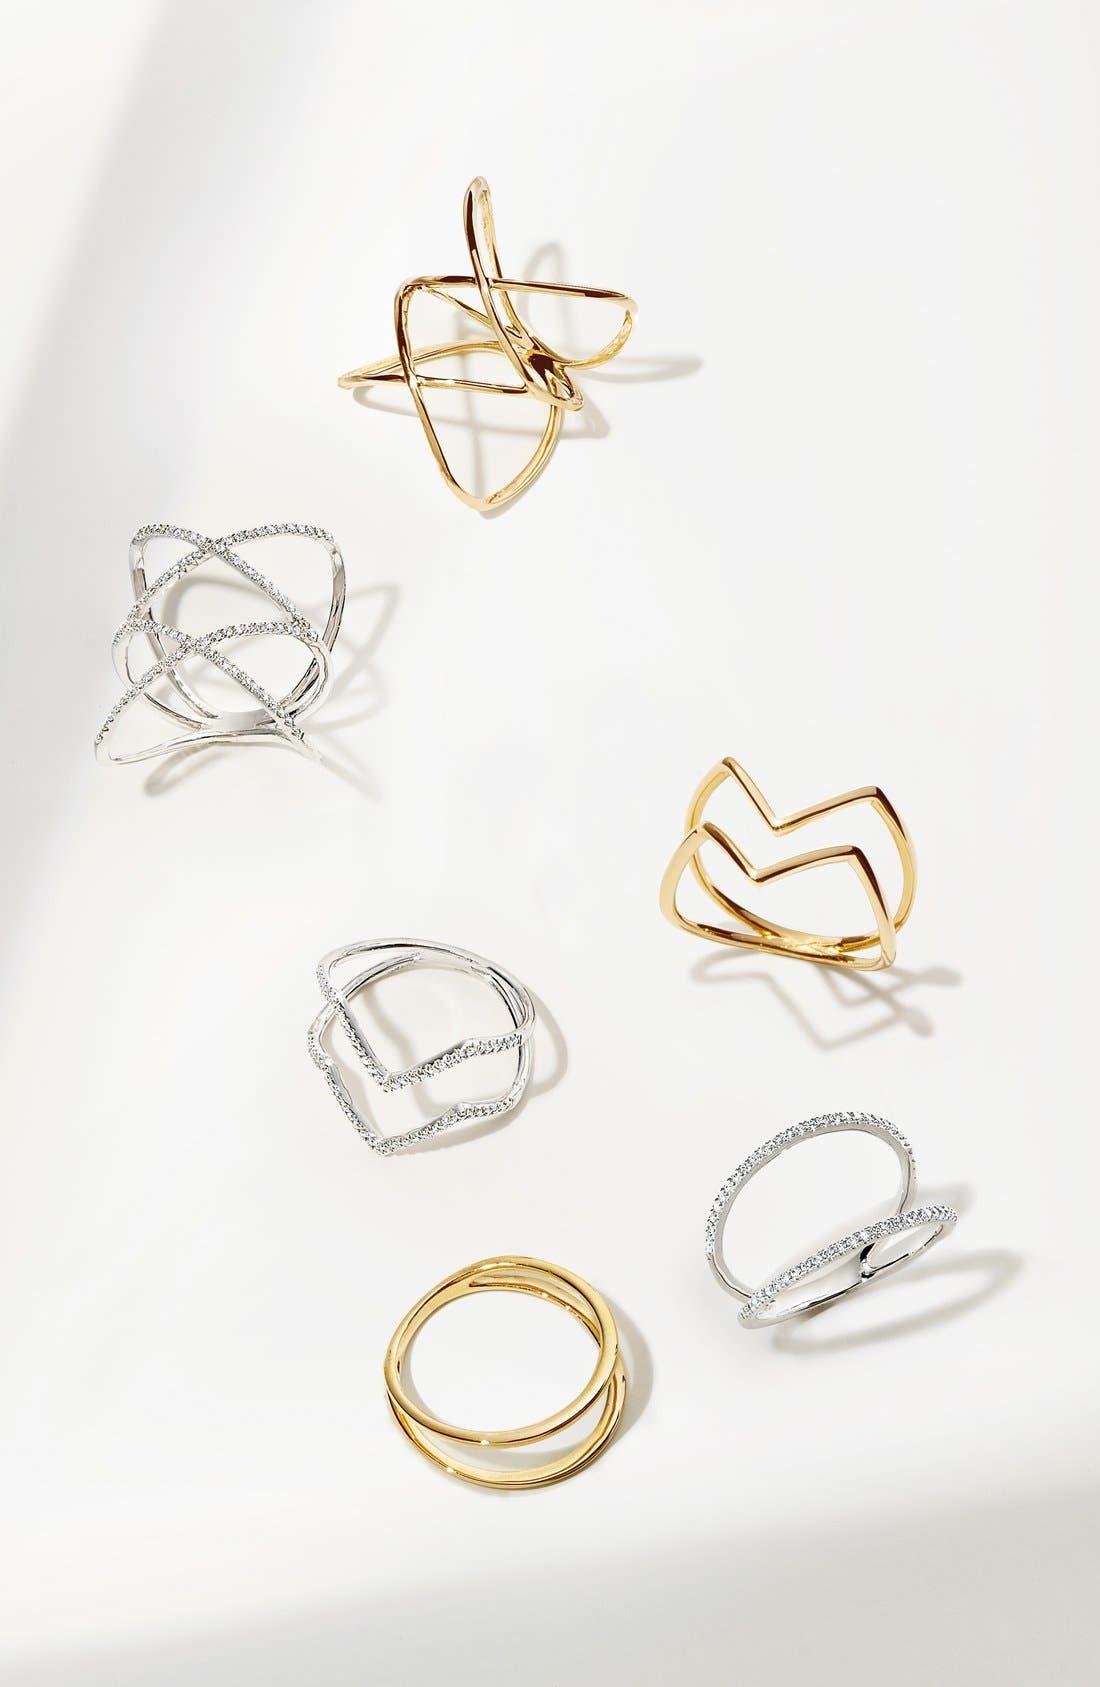 14KT Double Crisscross Ring,                             Alternate thumbnail 4, color,                             YELLOW GOLD